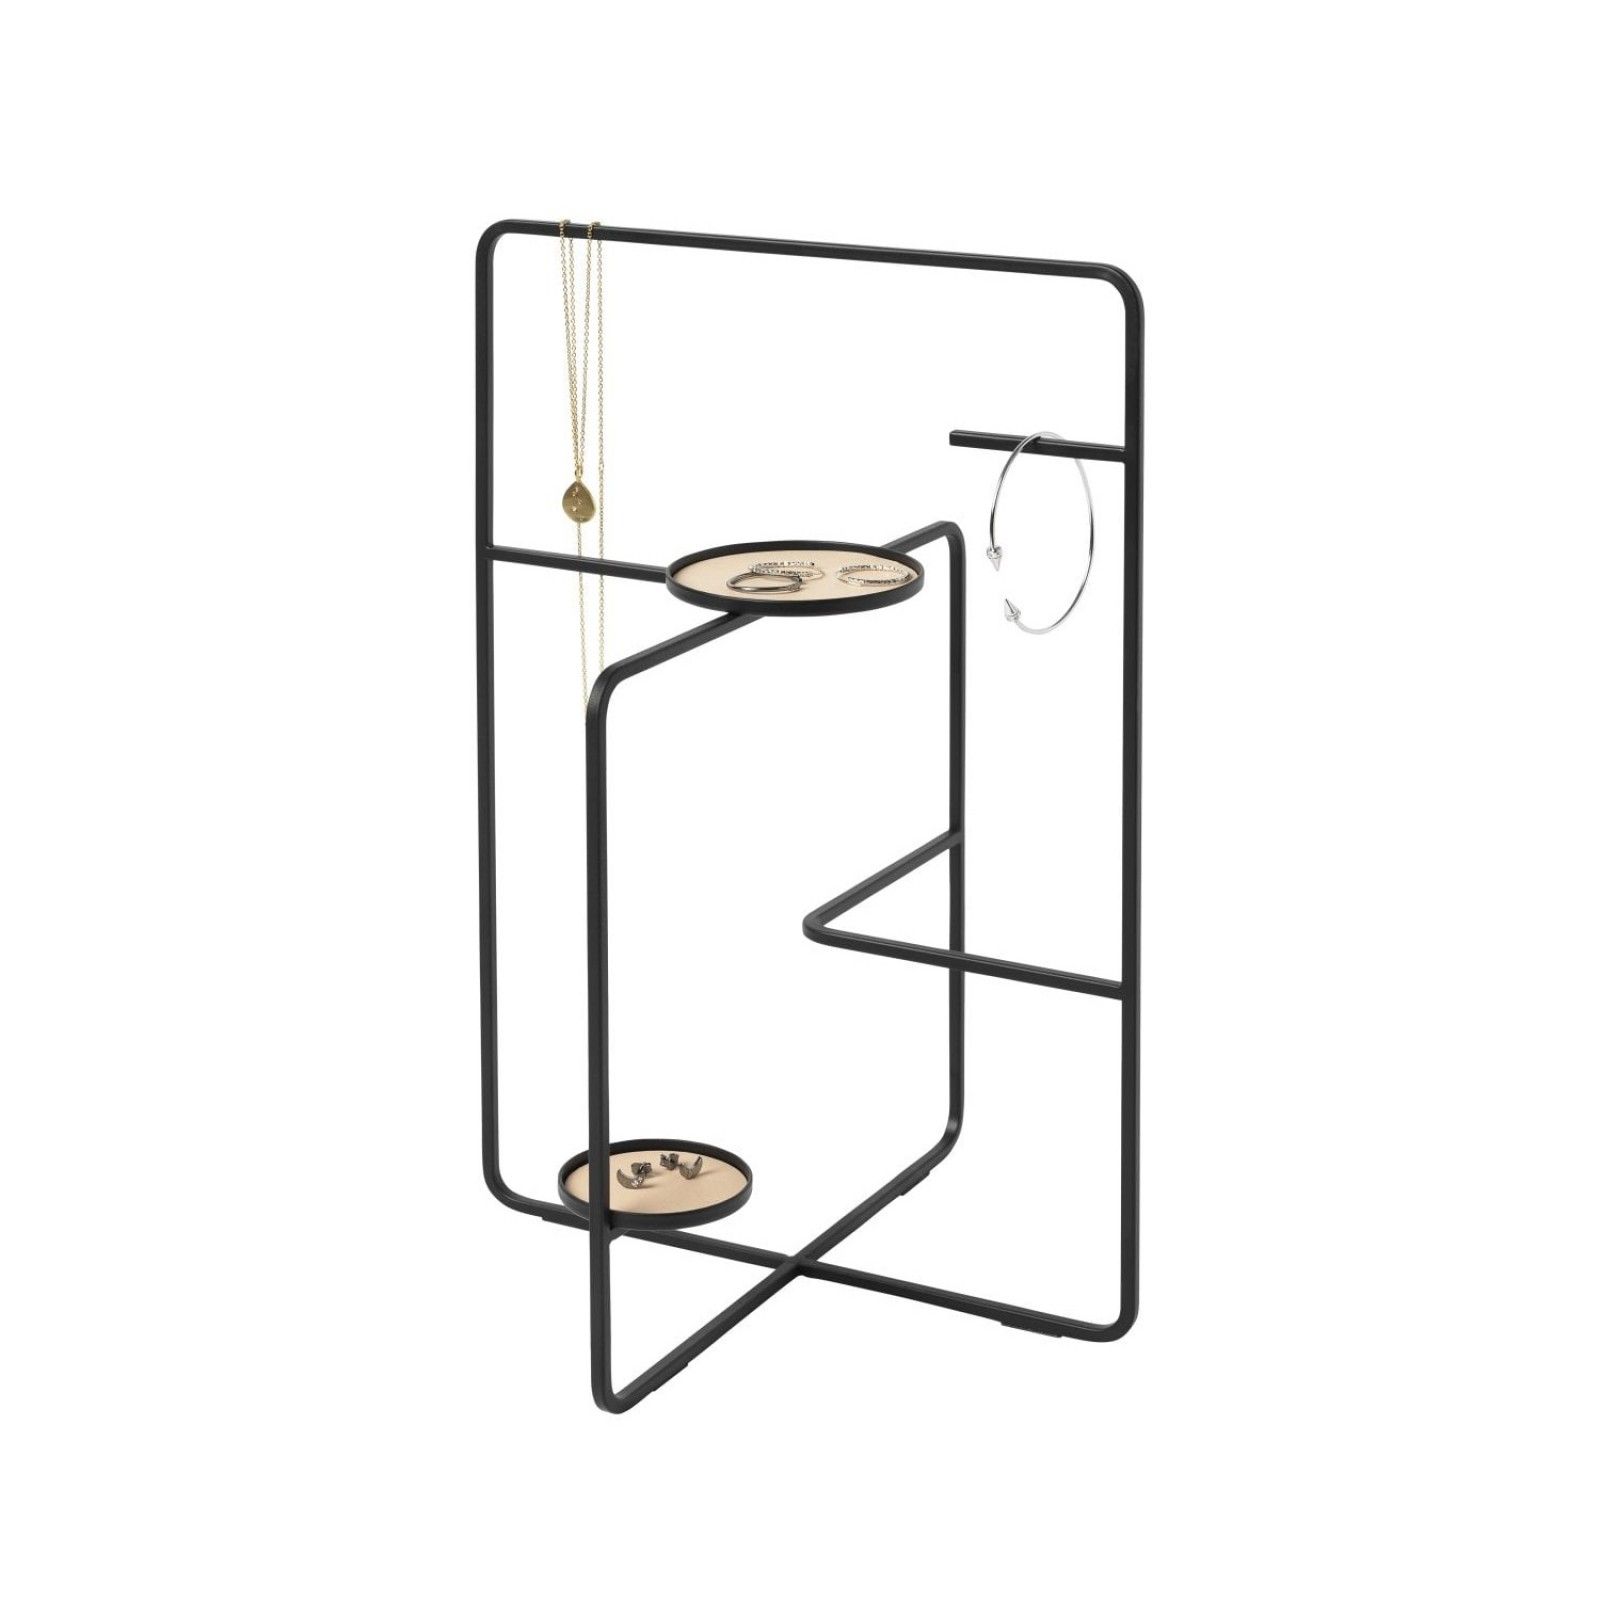 Castea Jewelry Stand - Blomus